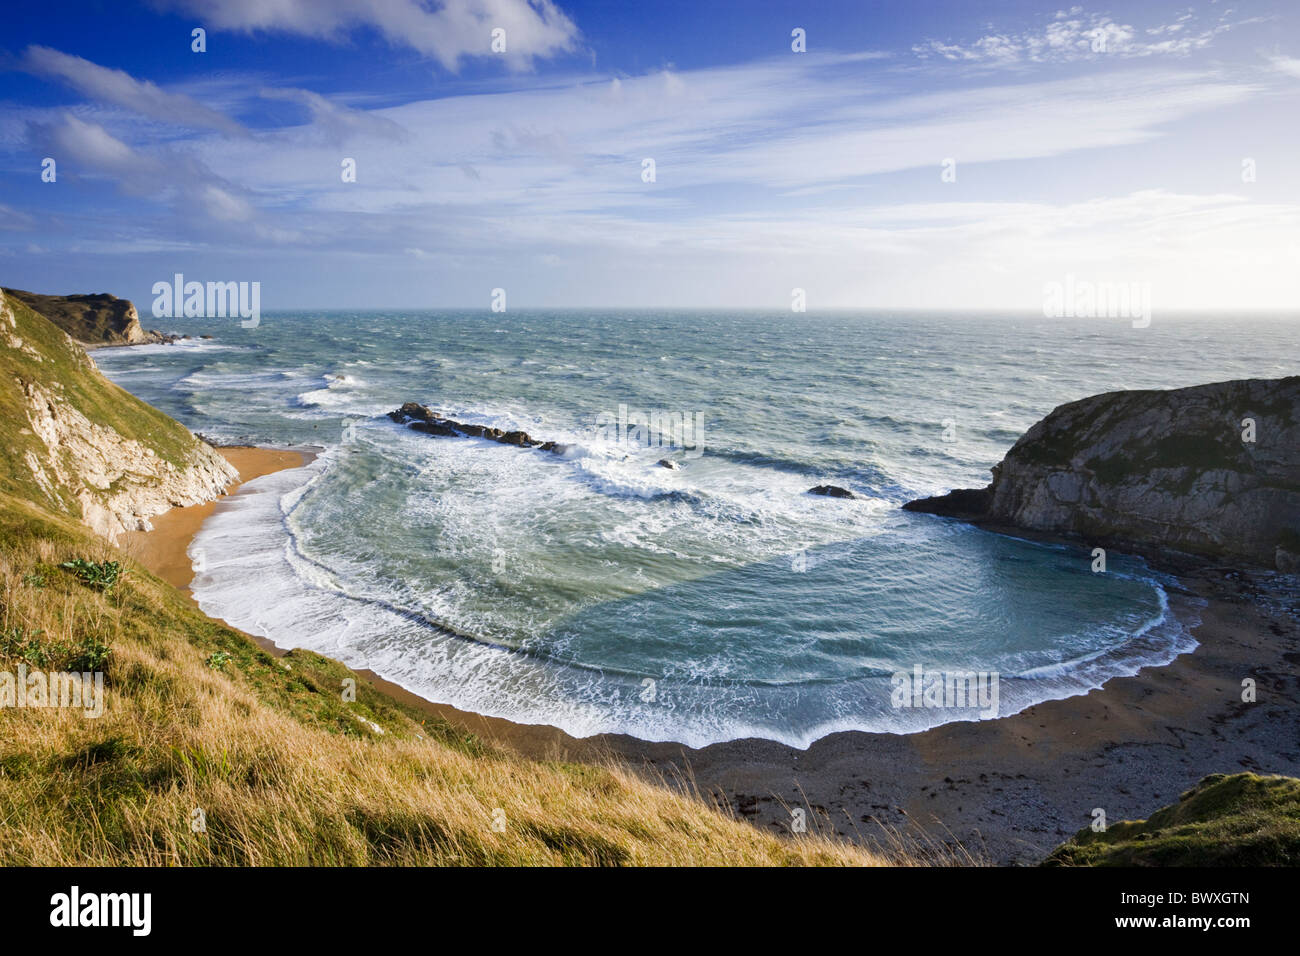 Man o' War Cove (St Oswald's Bay), Dorset, Reino Unido Imagen De Stock